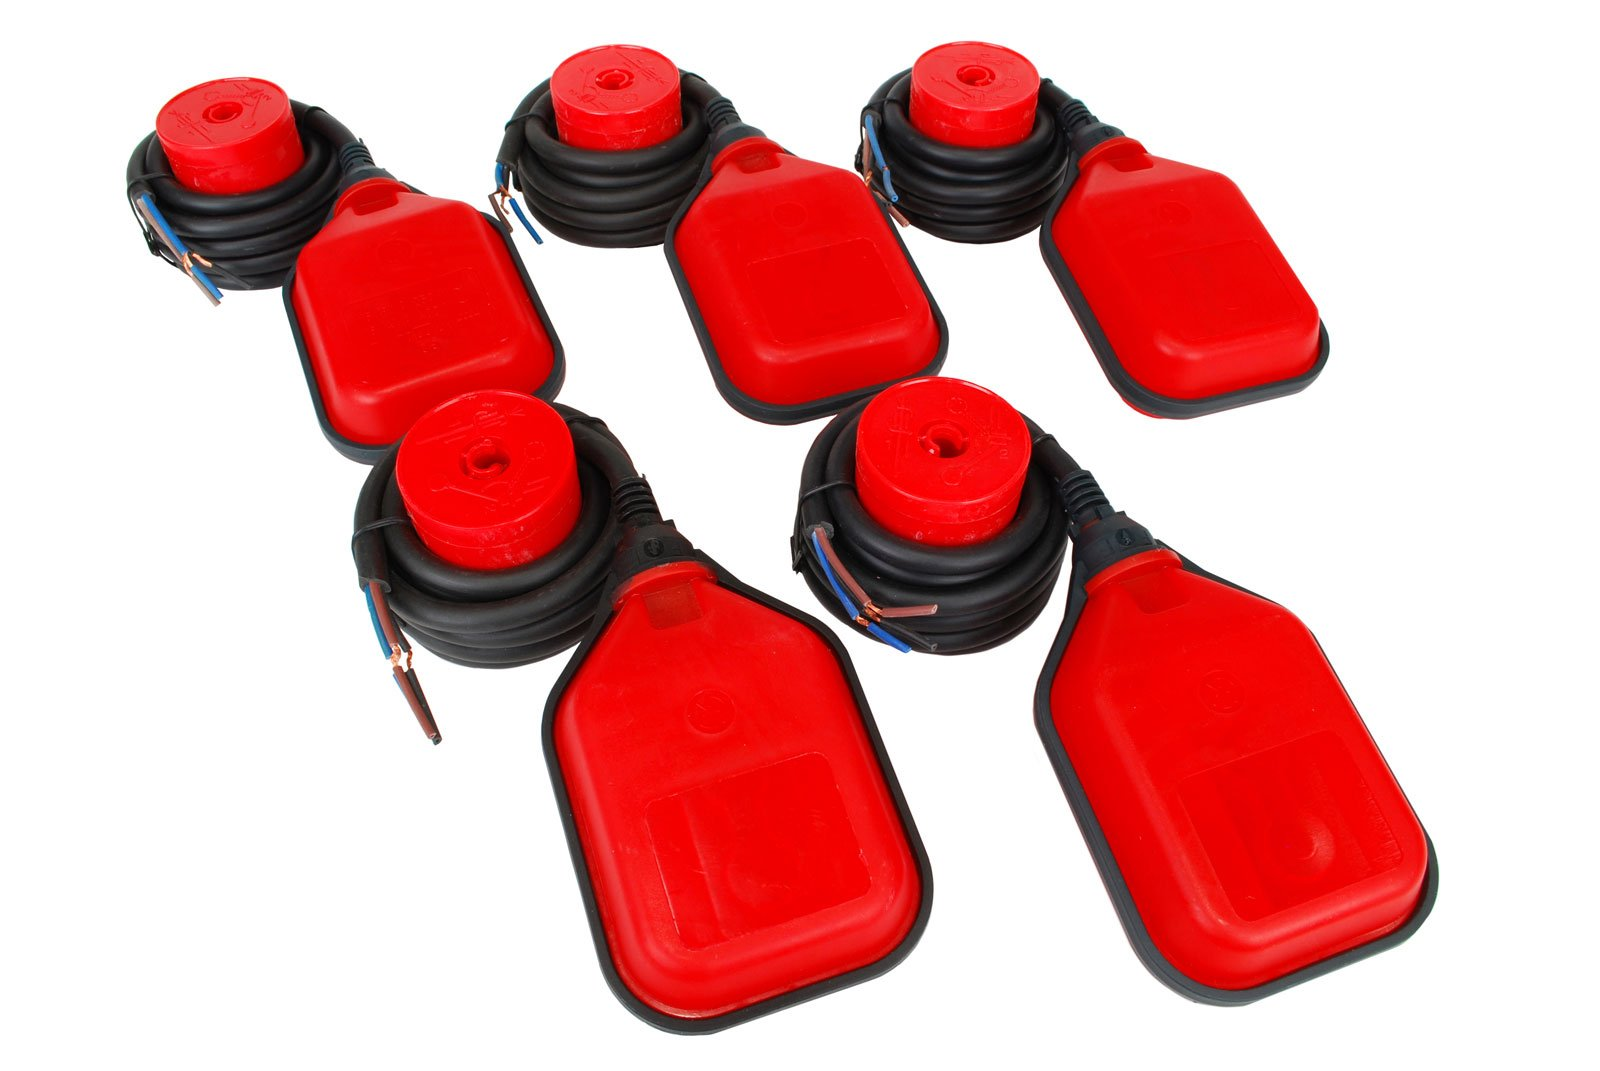 TEMCo 5 QTY Float Switch Liquid or Water Level Sensor Sump Fluidtank 5 YEAR WARRANTY